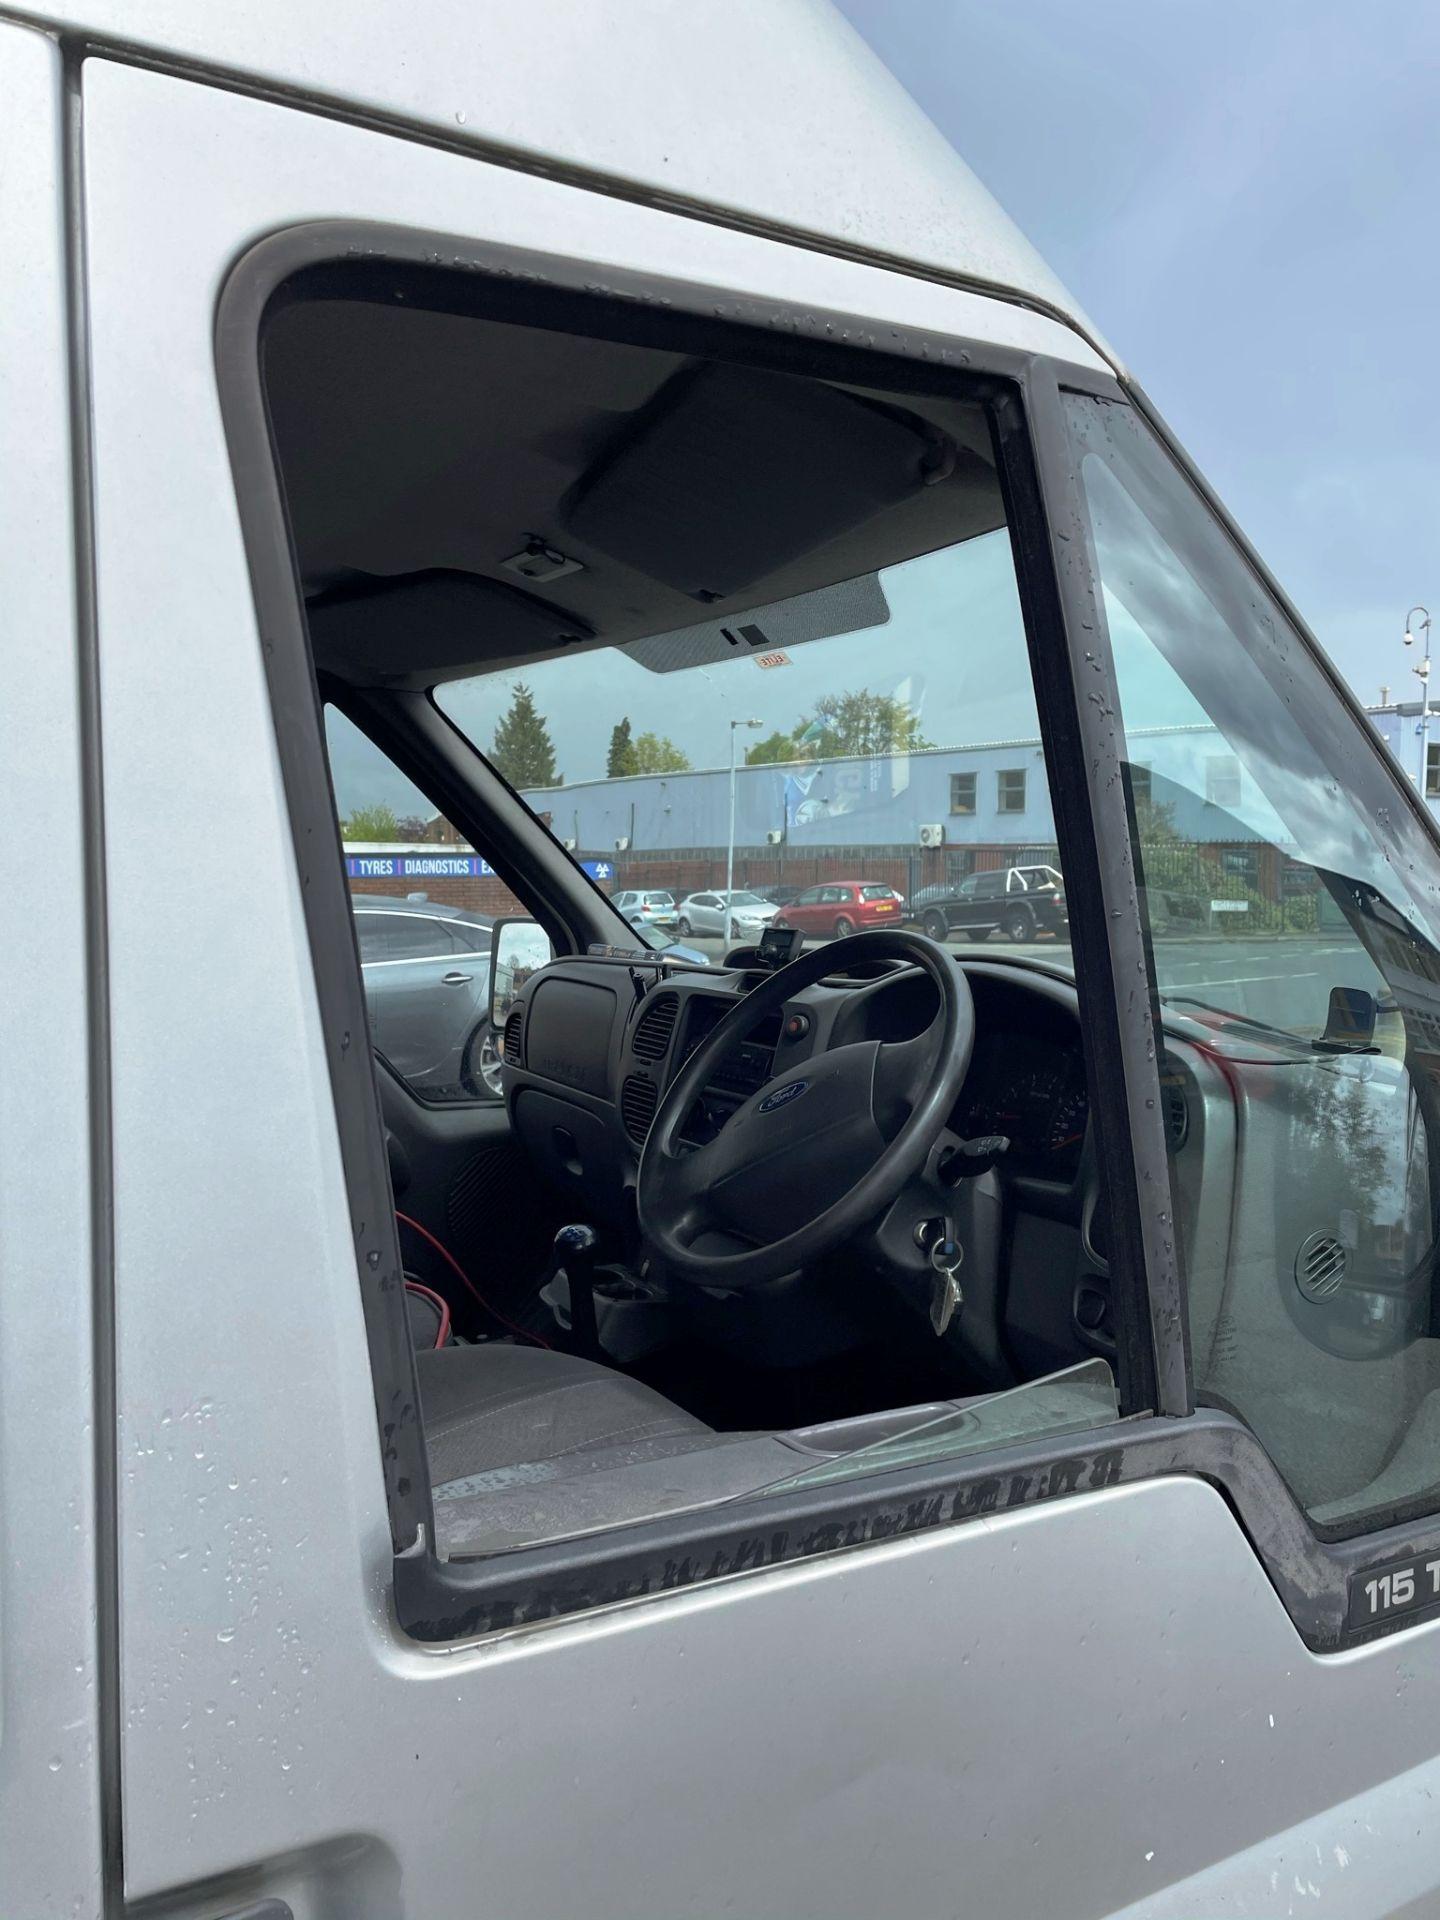 Ford Transit 350 LWB Panel Van   05 Plate  168,443 Miles - Image 17 of 22